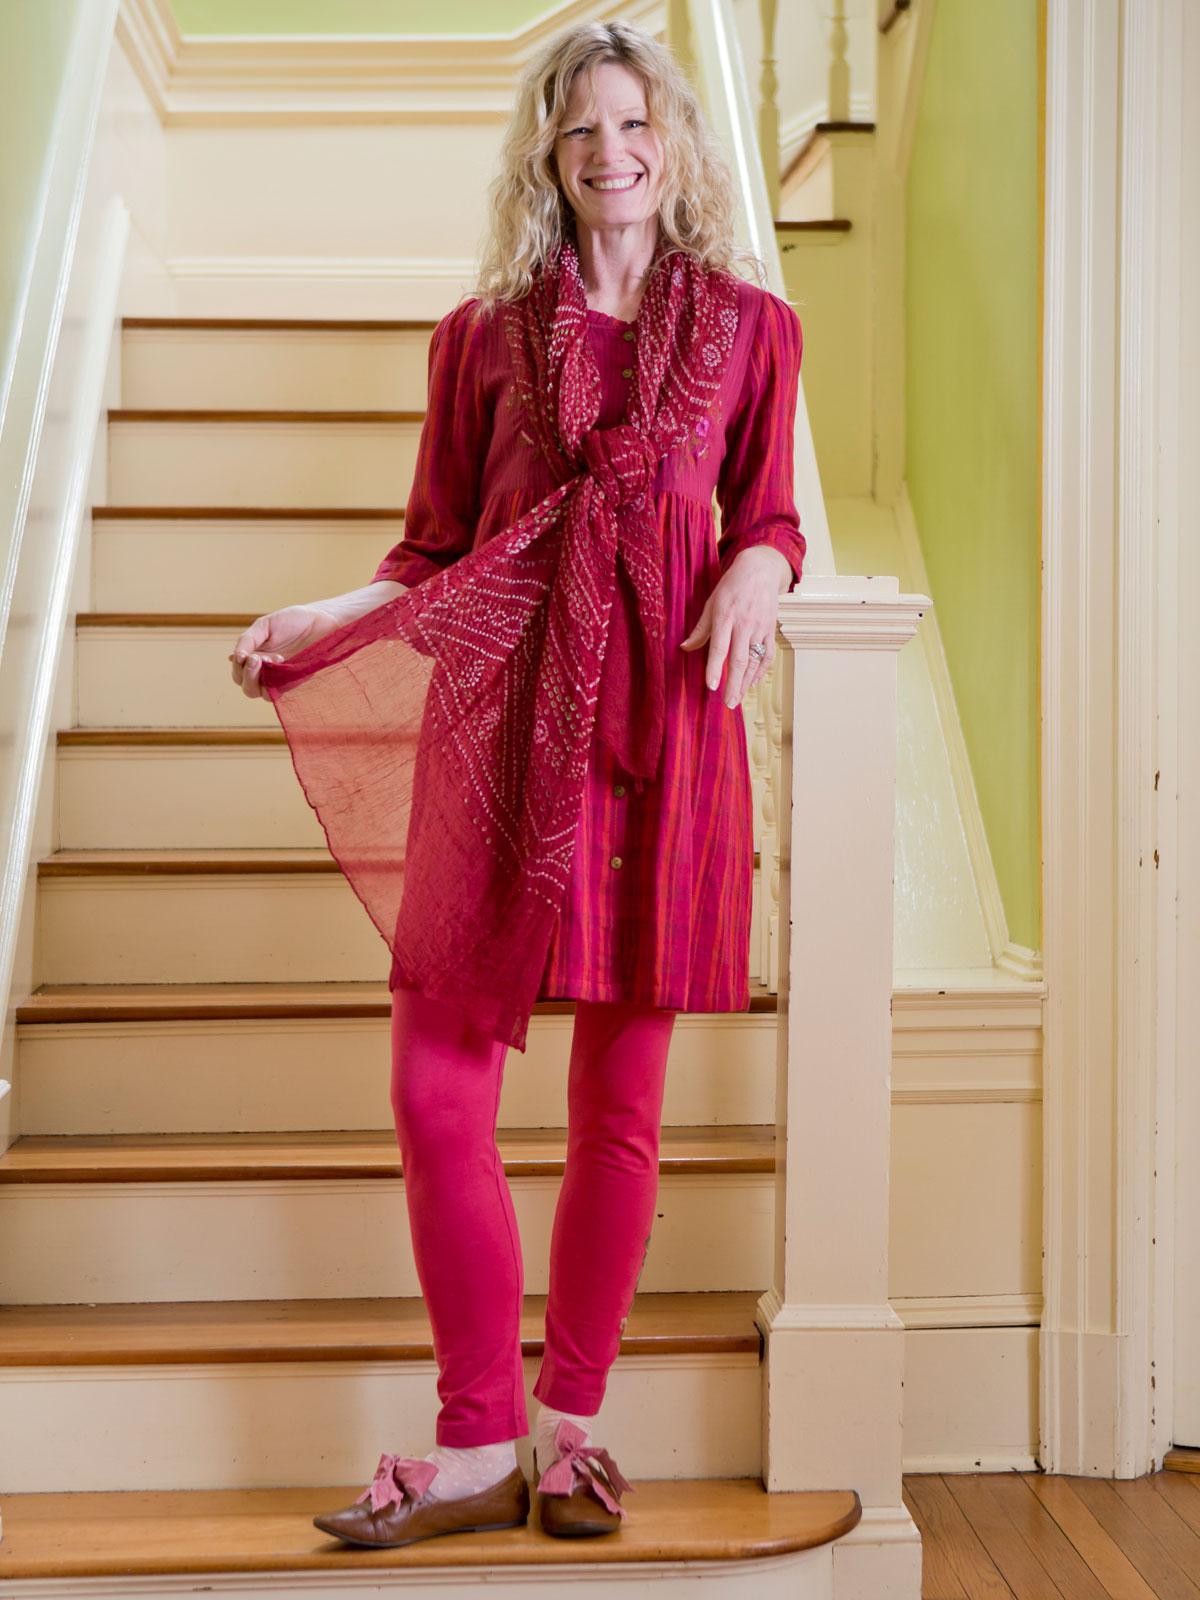 ladies fashion sydney - photo#1